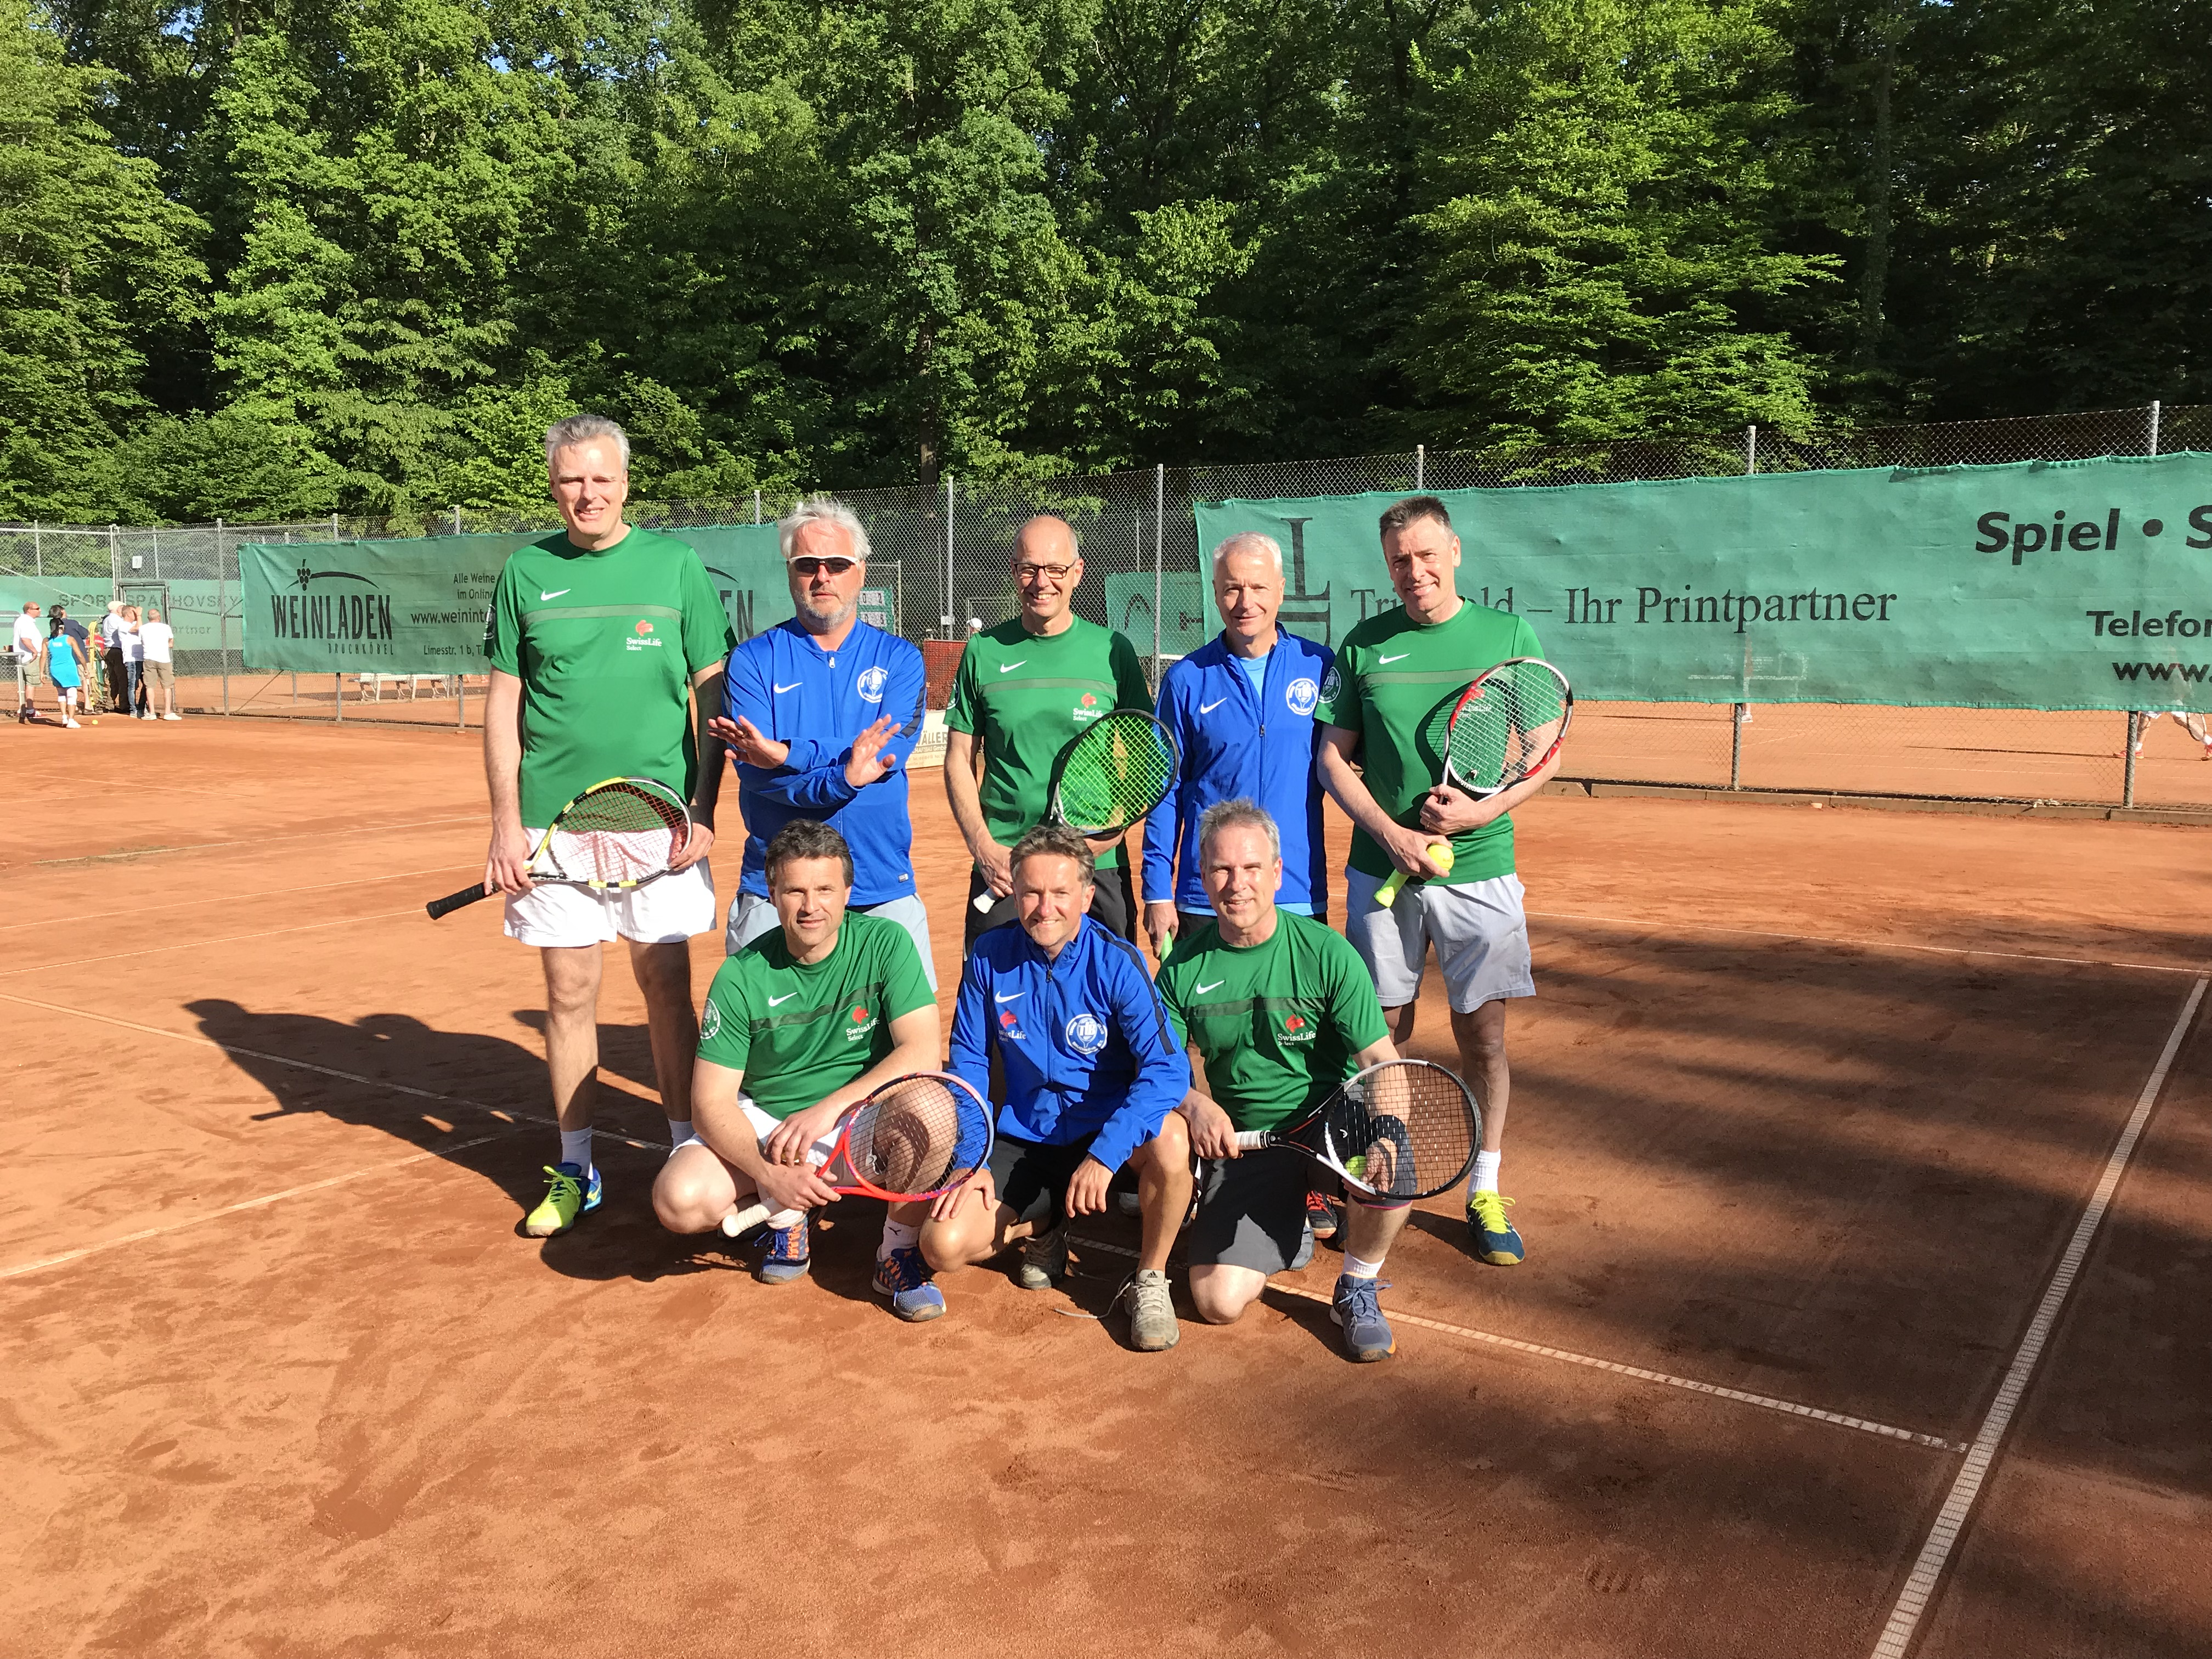 Spielbericht: Bezirksoberliga, Herren 50, TCB – Teutonia Hausen 8:1